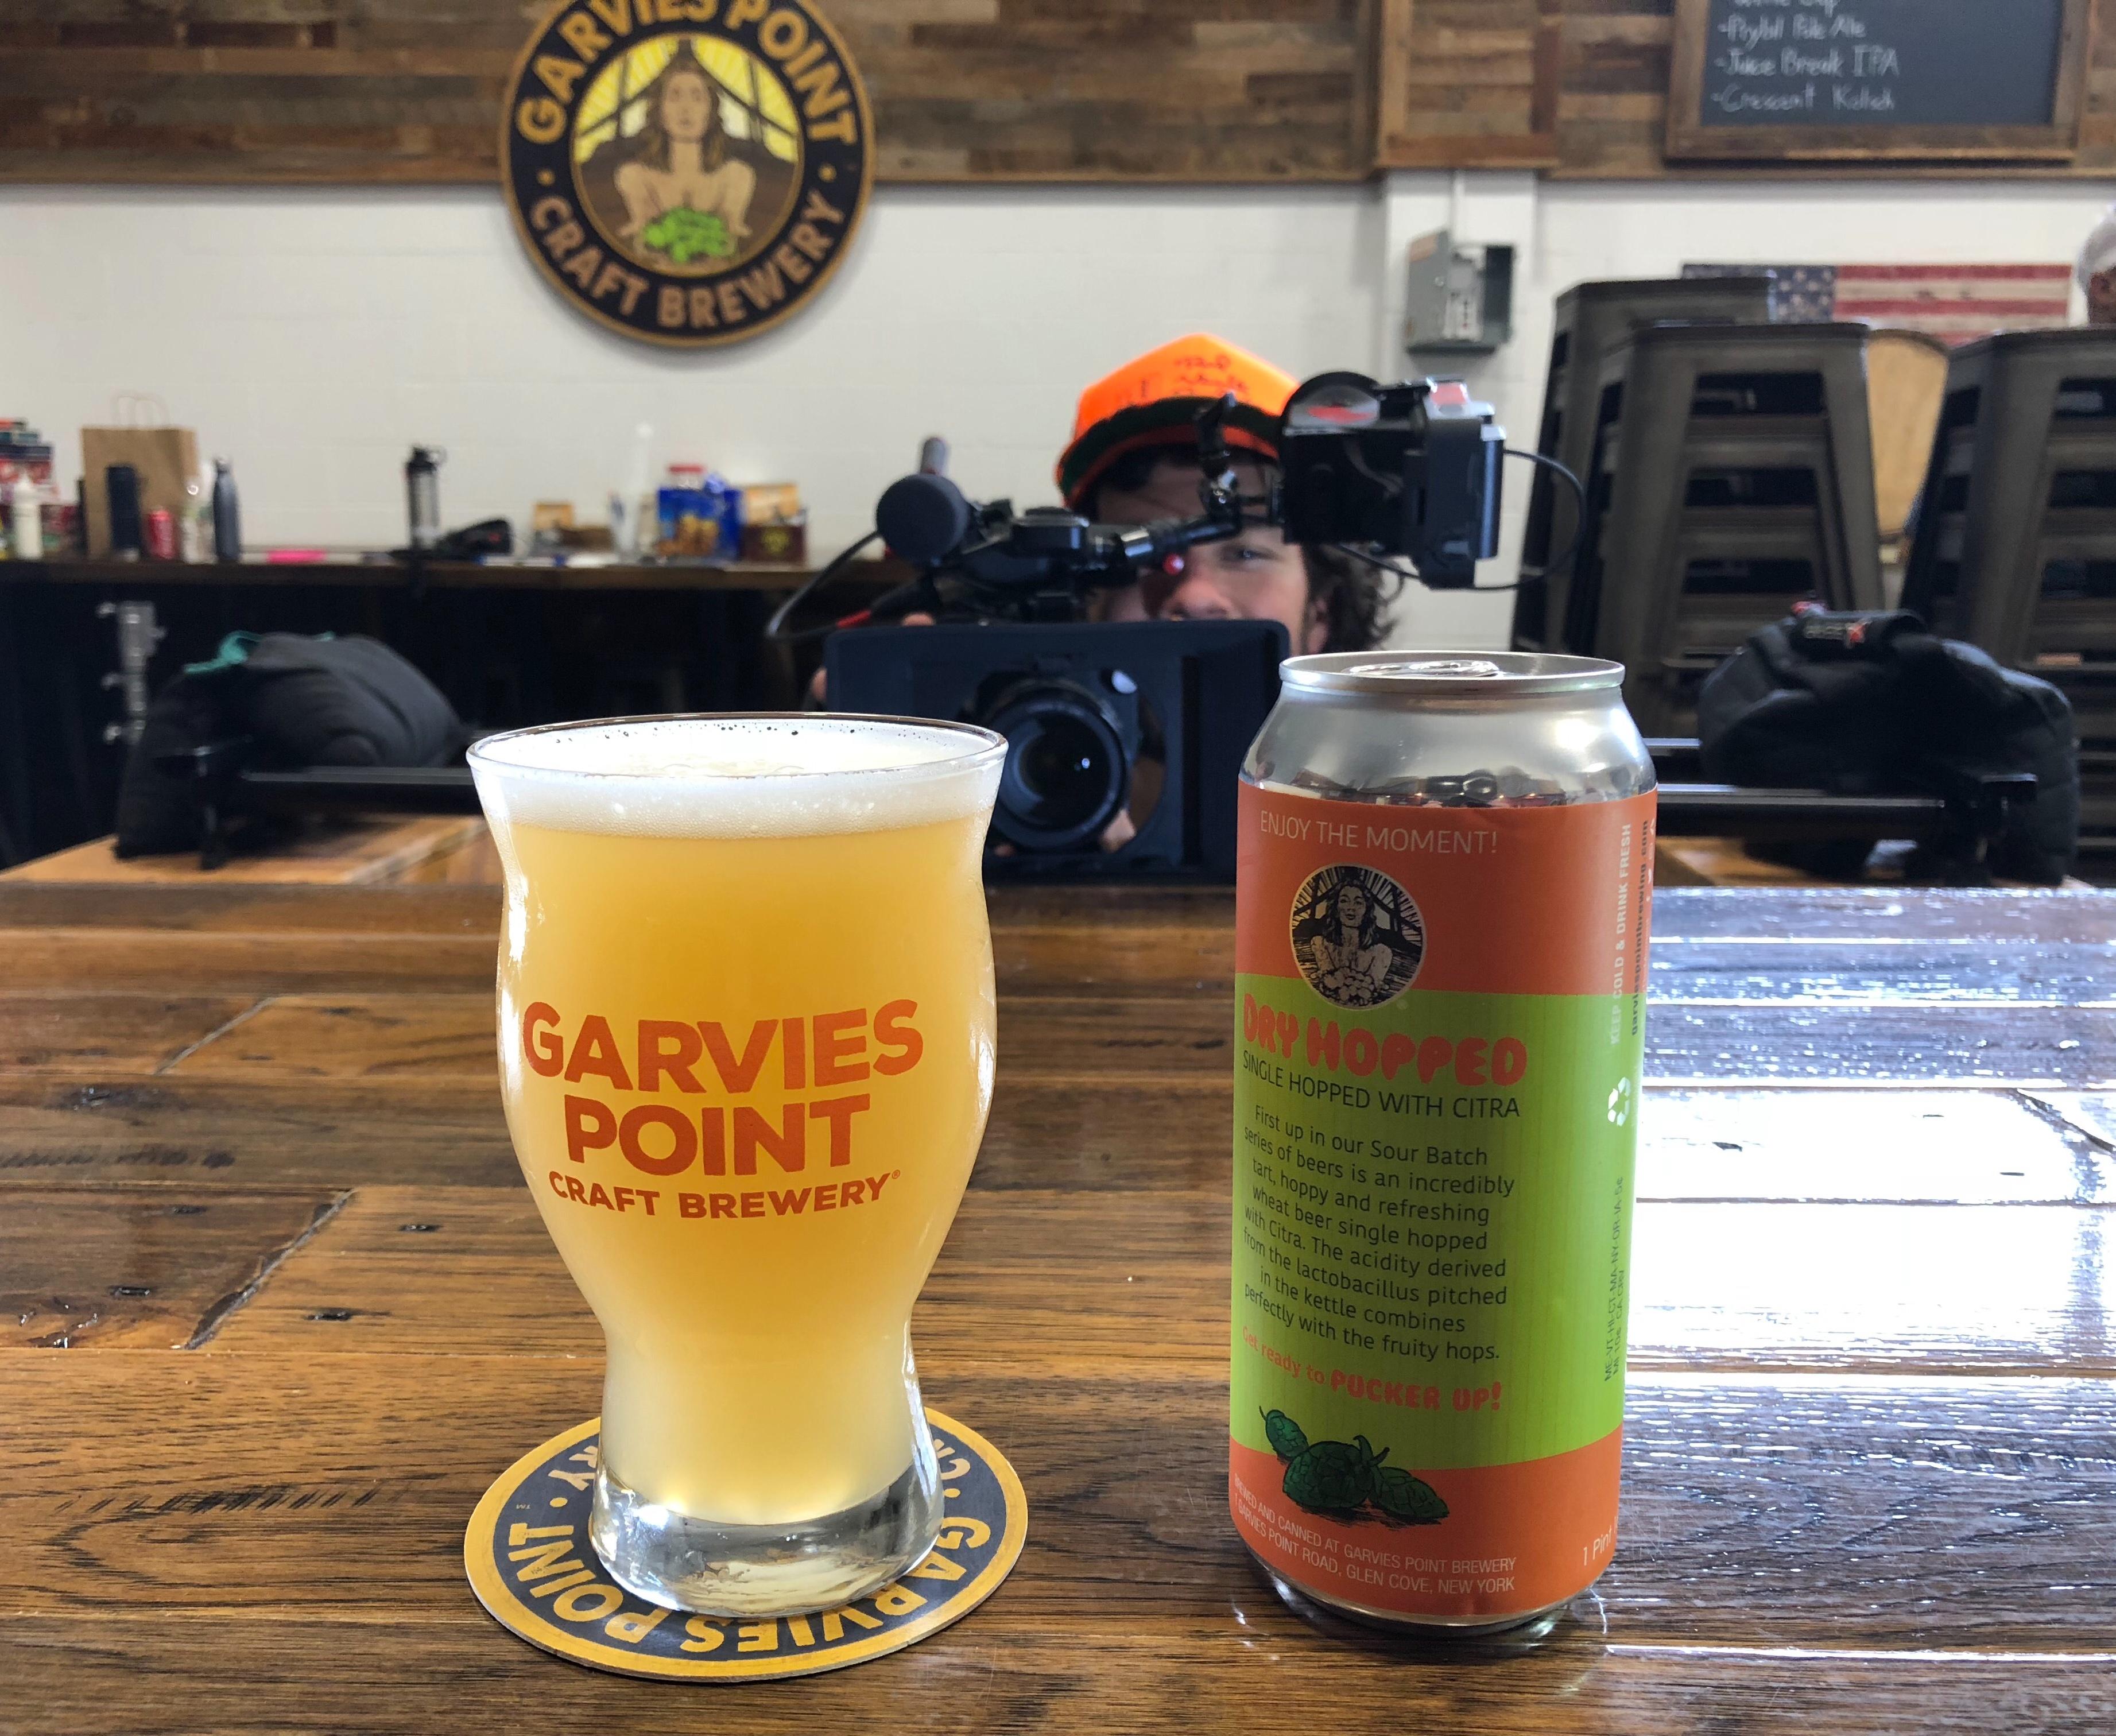 Garvies Point Brewing